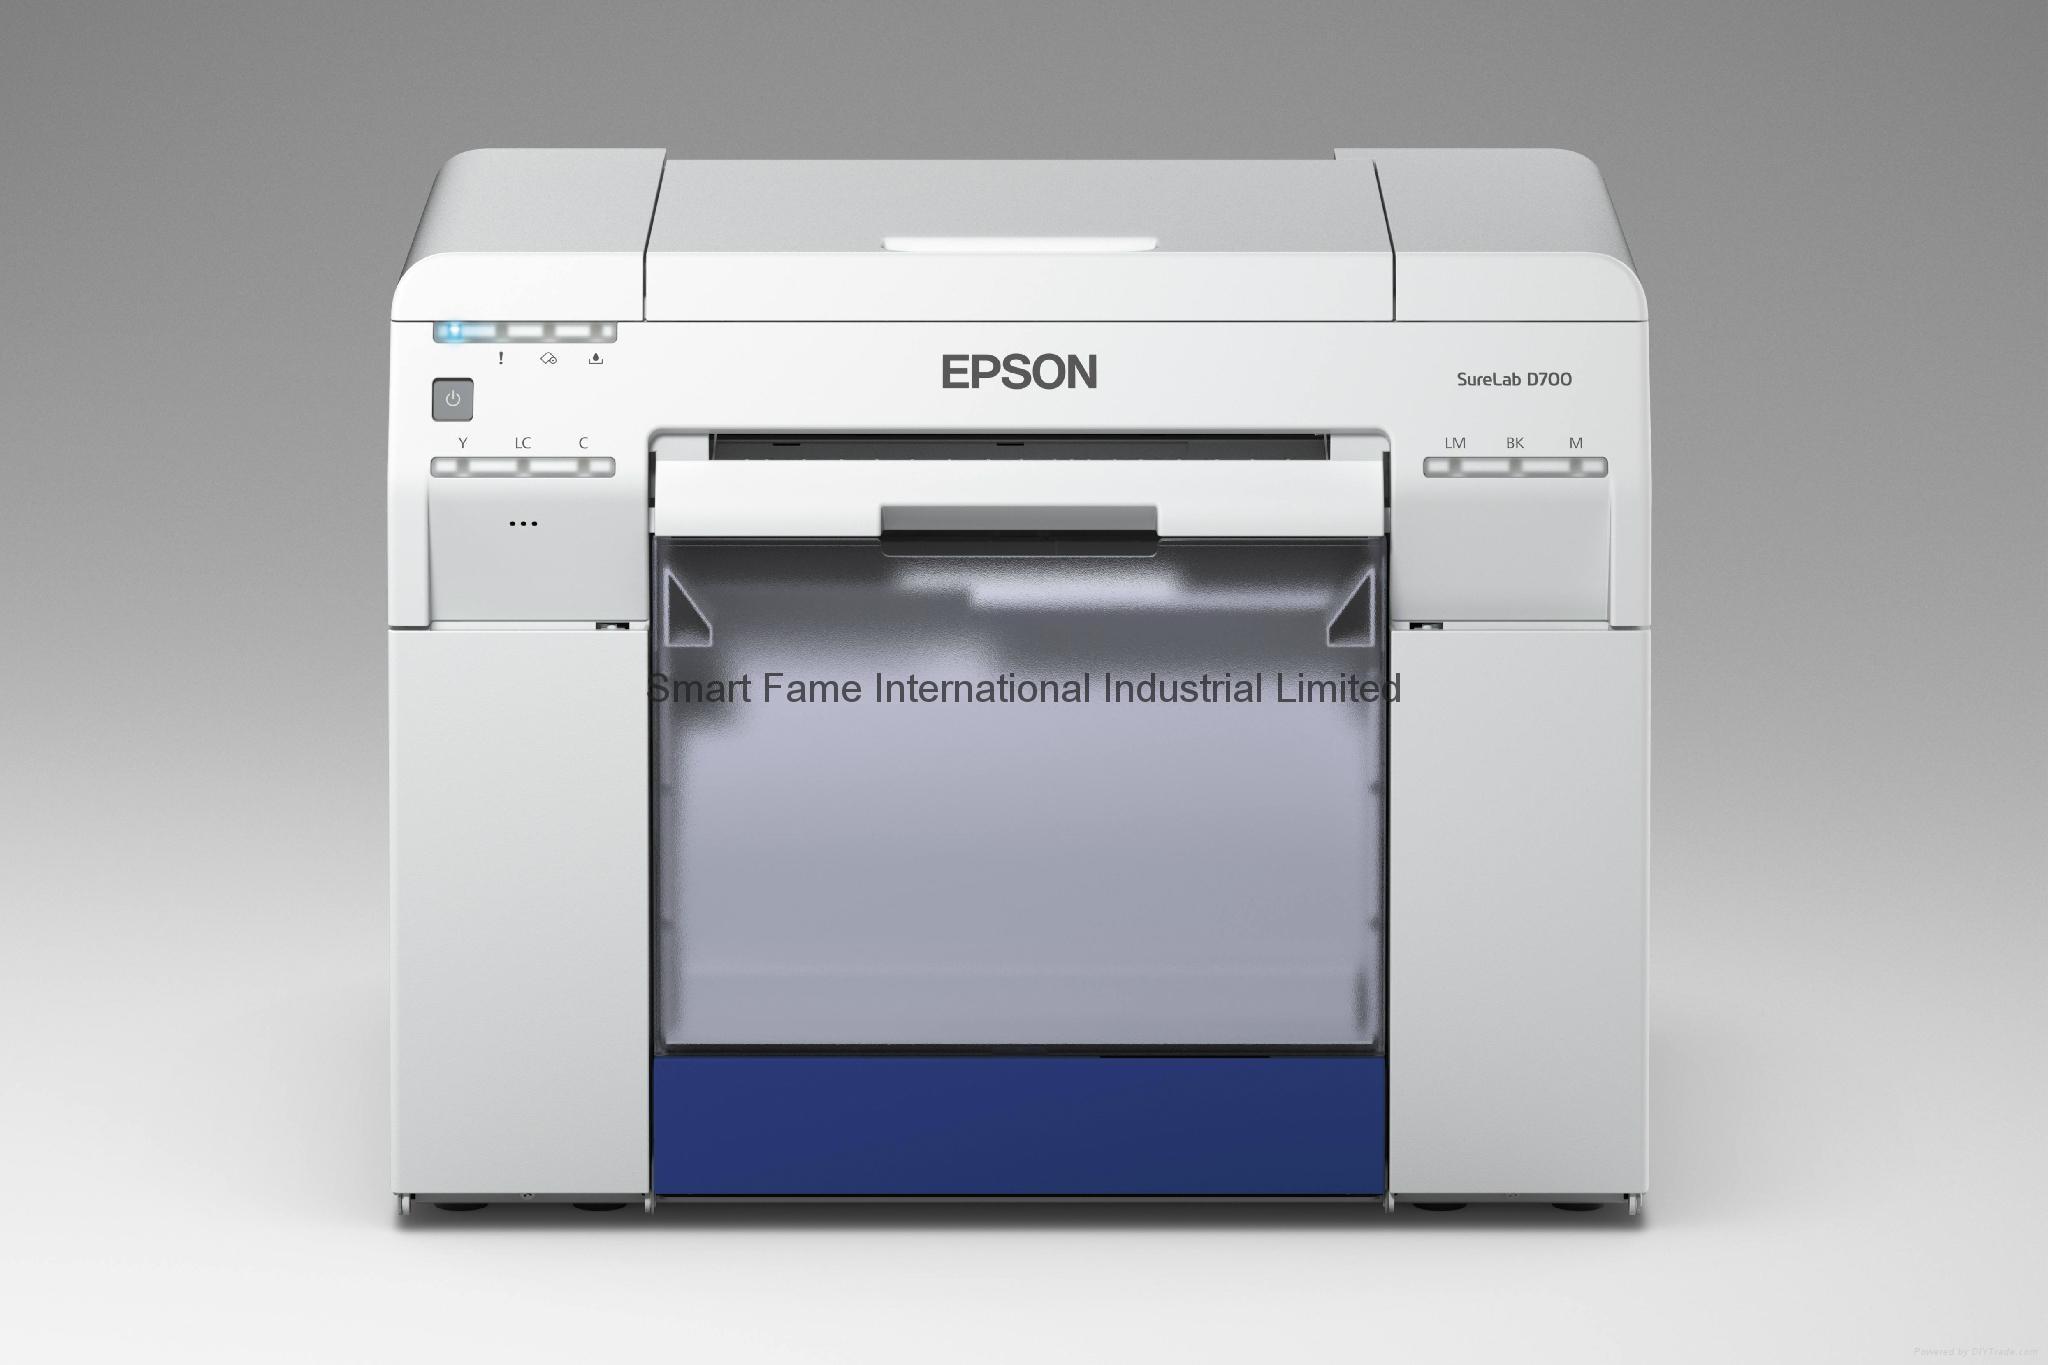 EPSON D700, Fuji Dx-100墨盒